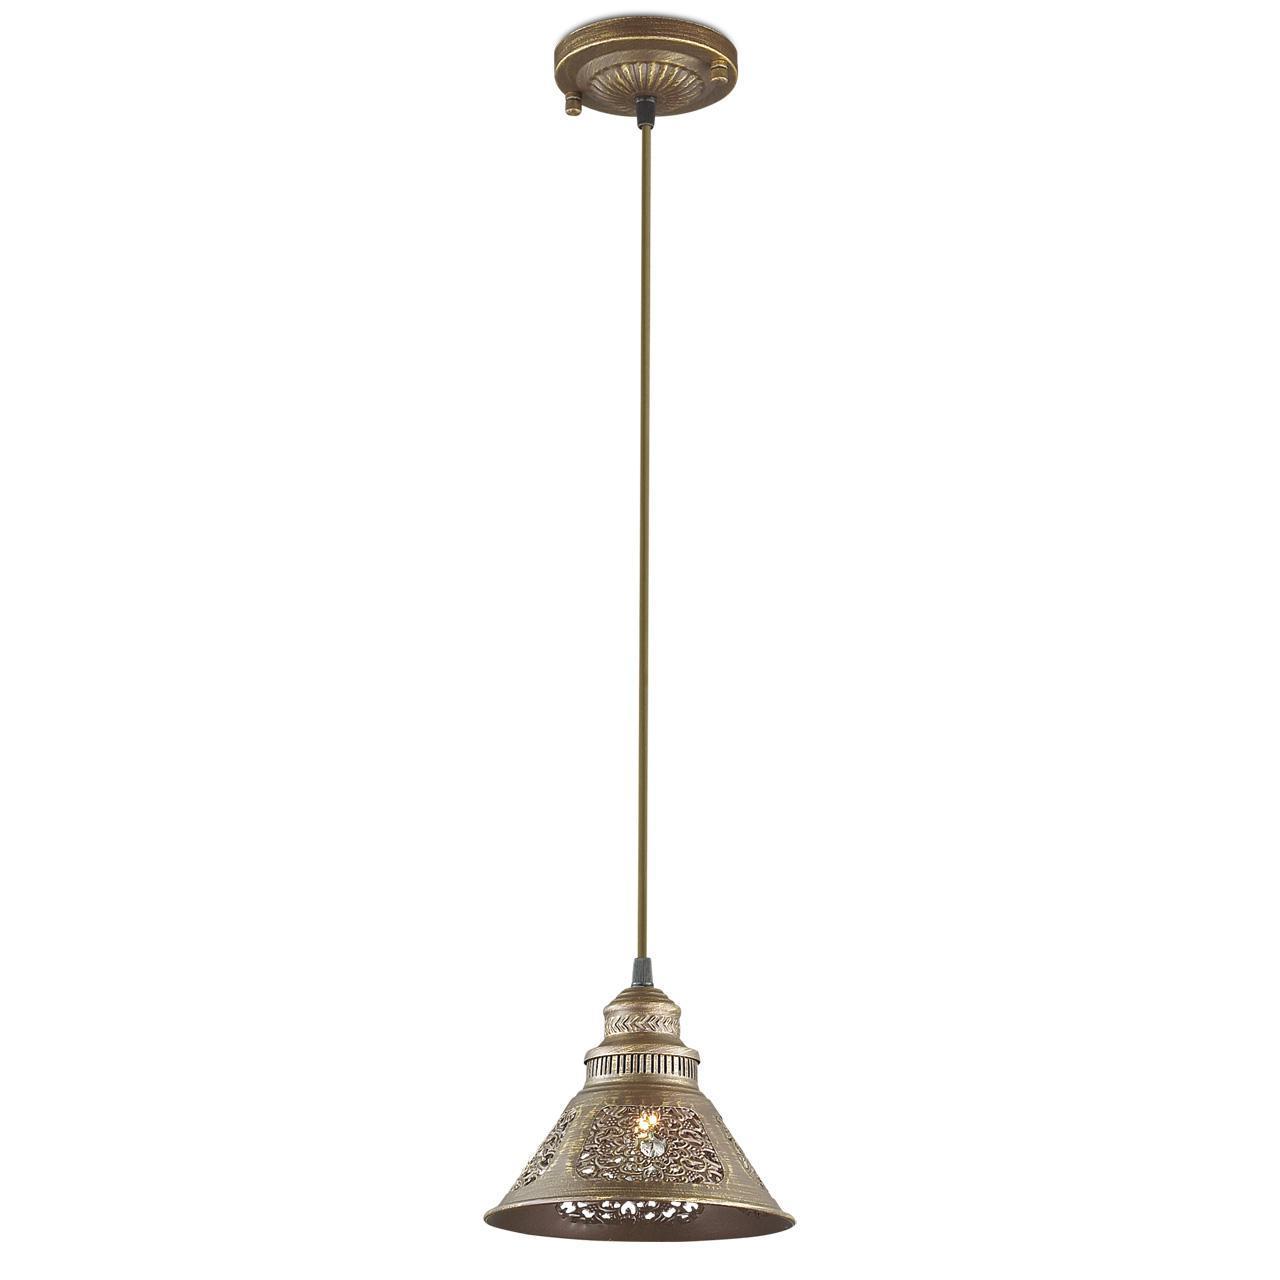 Подвесной светильник Odeon Light Kamun 2843/1 бра odeon light kamun 2843 1w